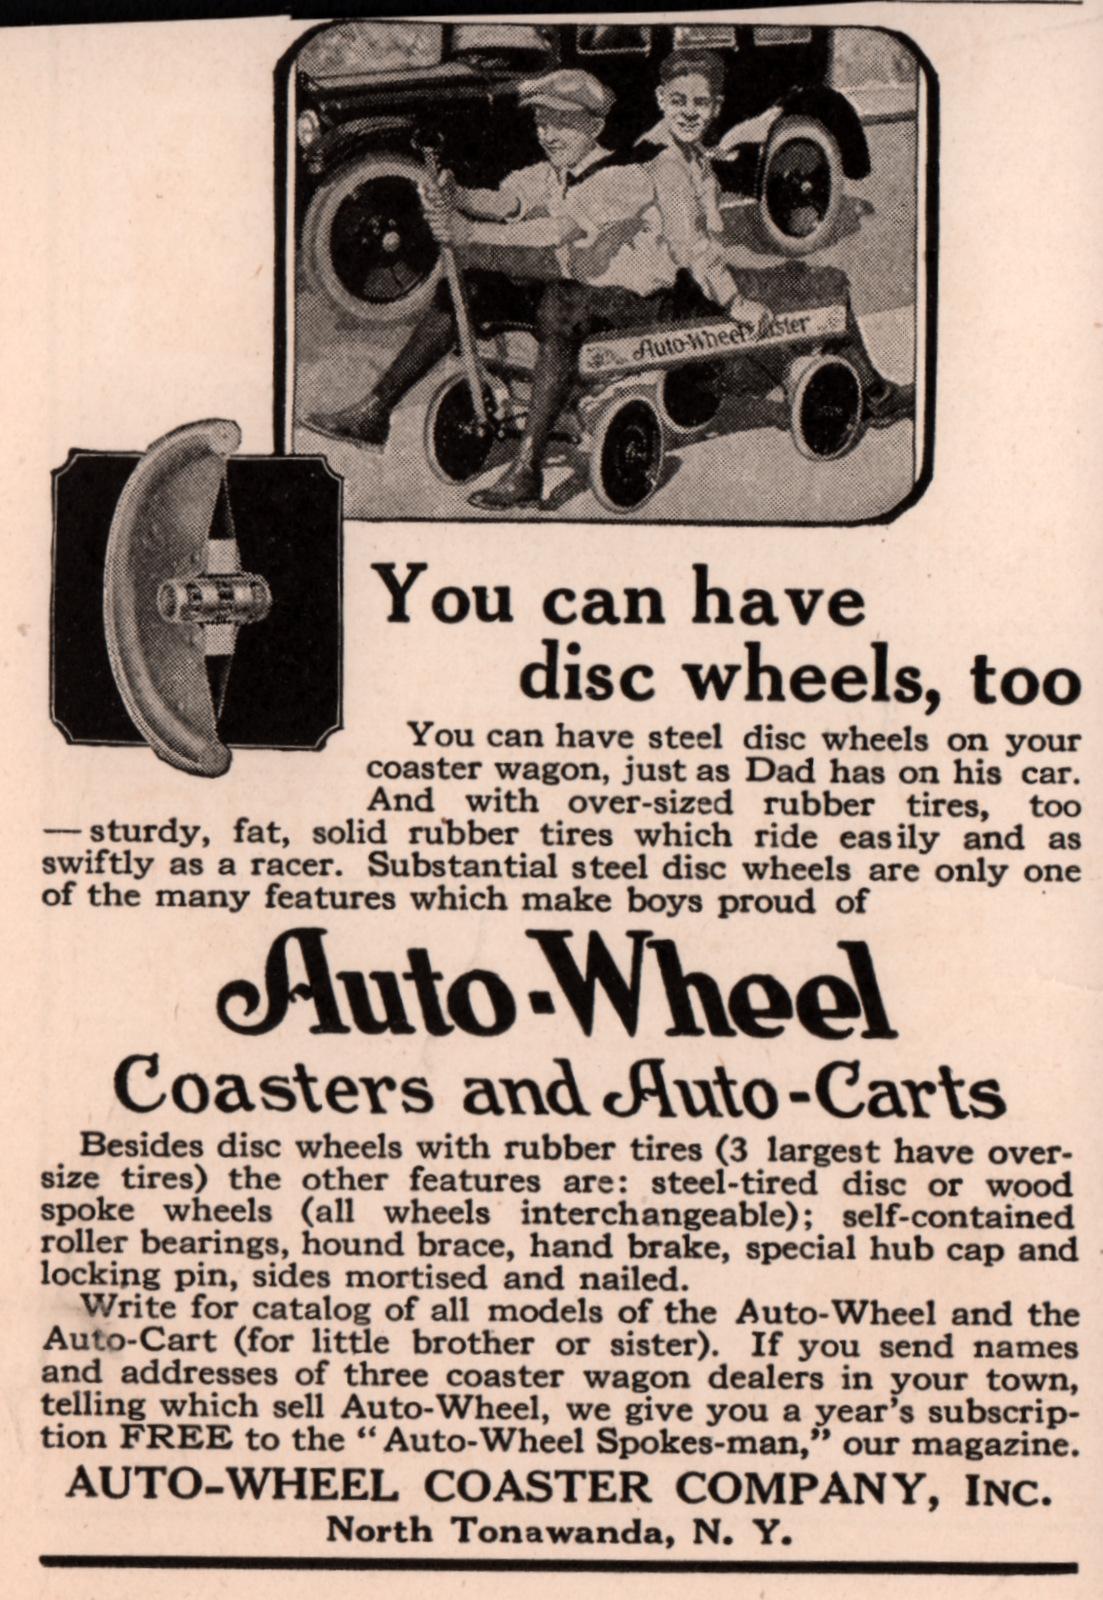 Auto Wheel Coaster Co., ad.jpg